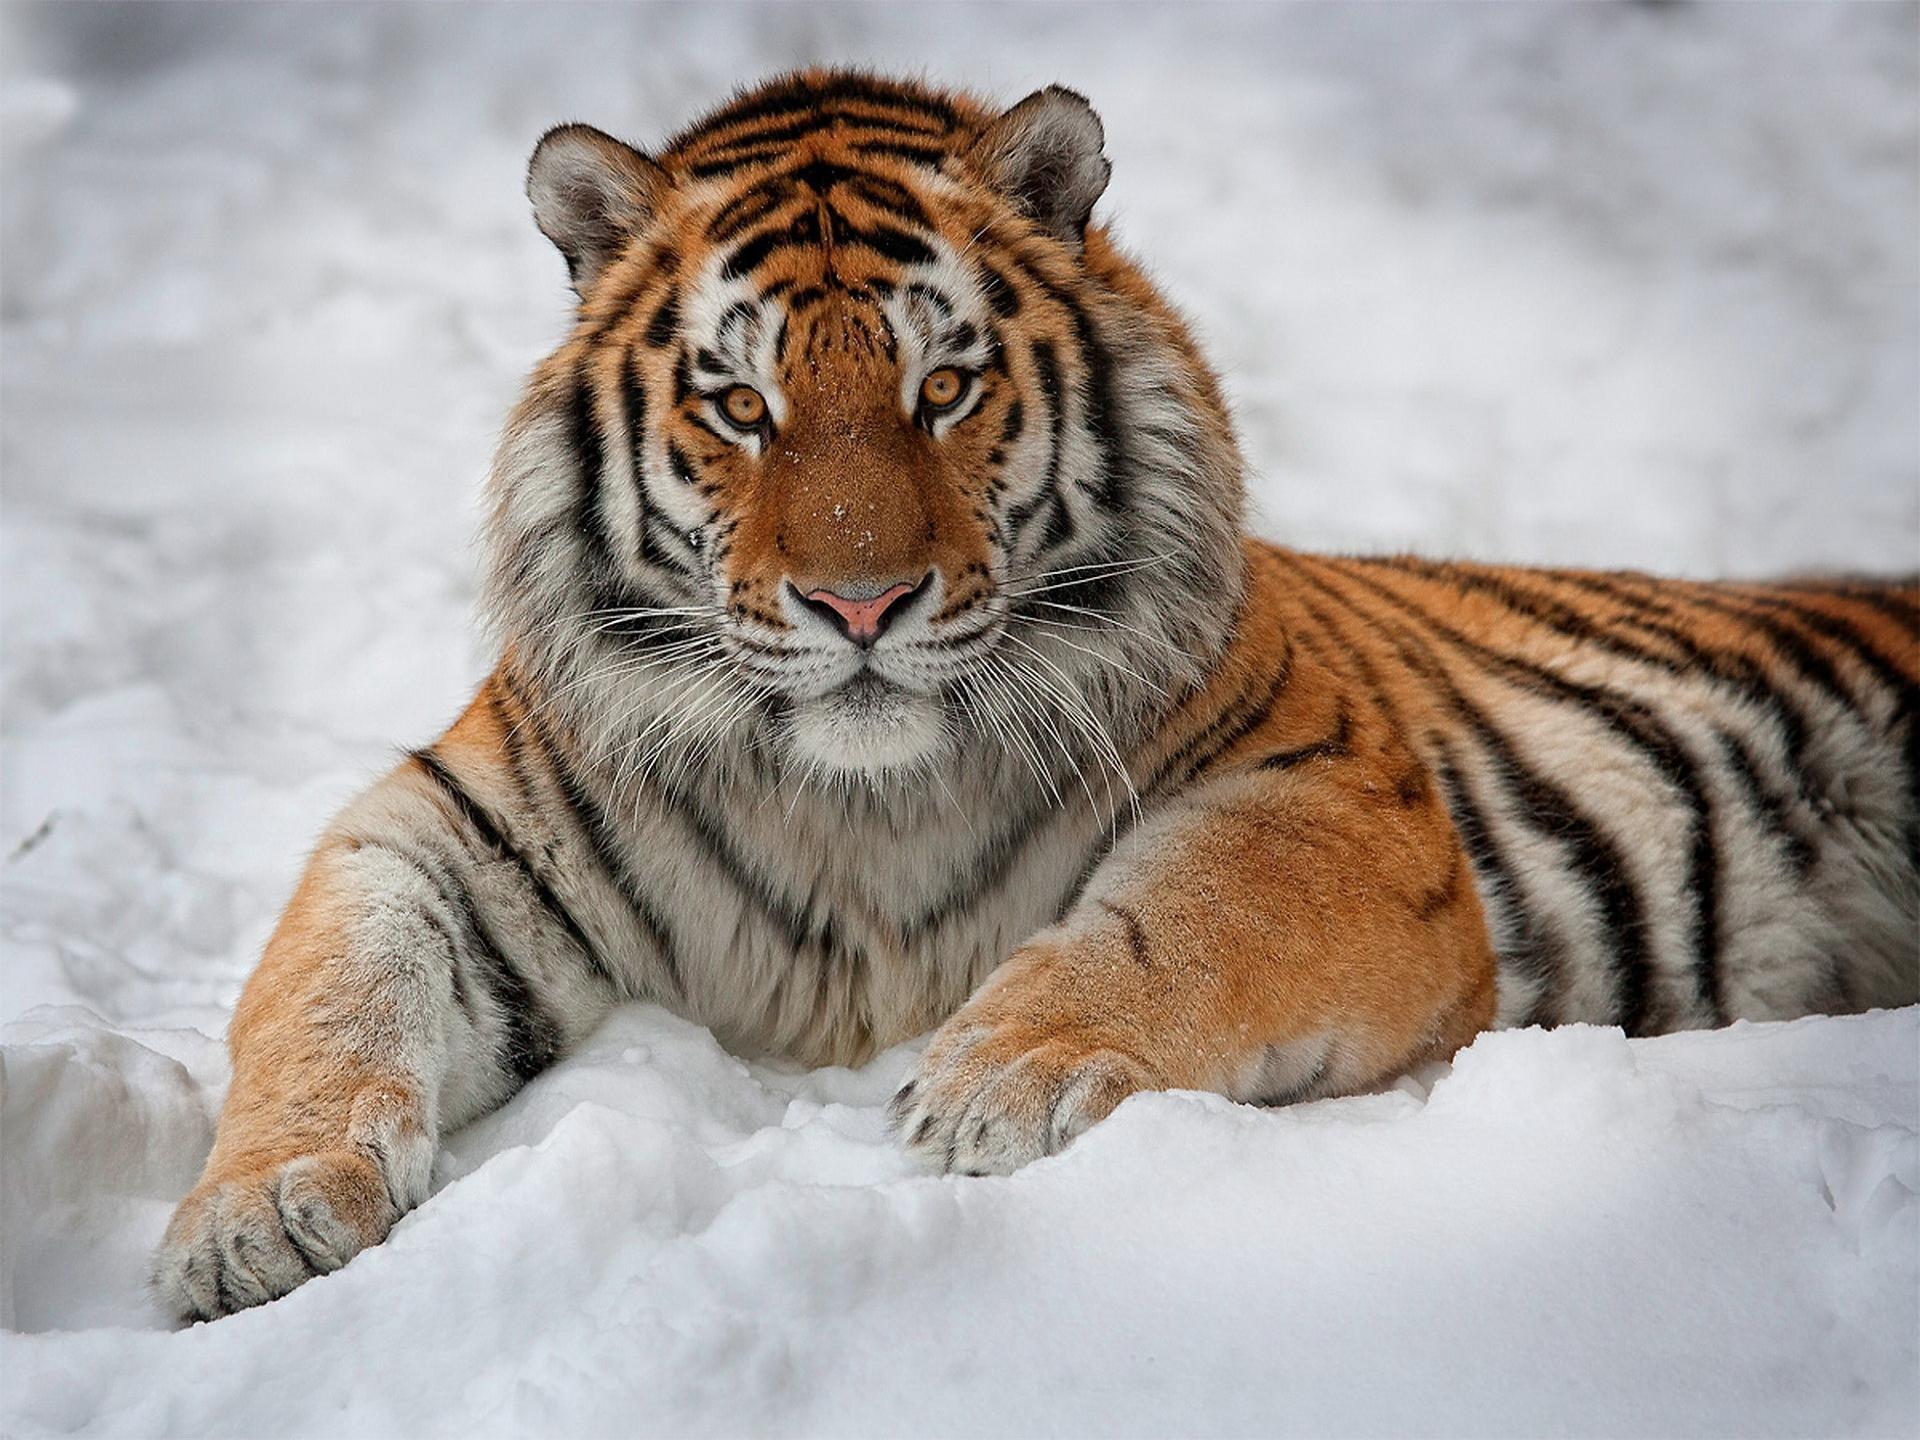 free download tiger wallpaper id:115762 hd 1920x1440 for desktop